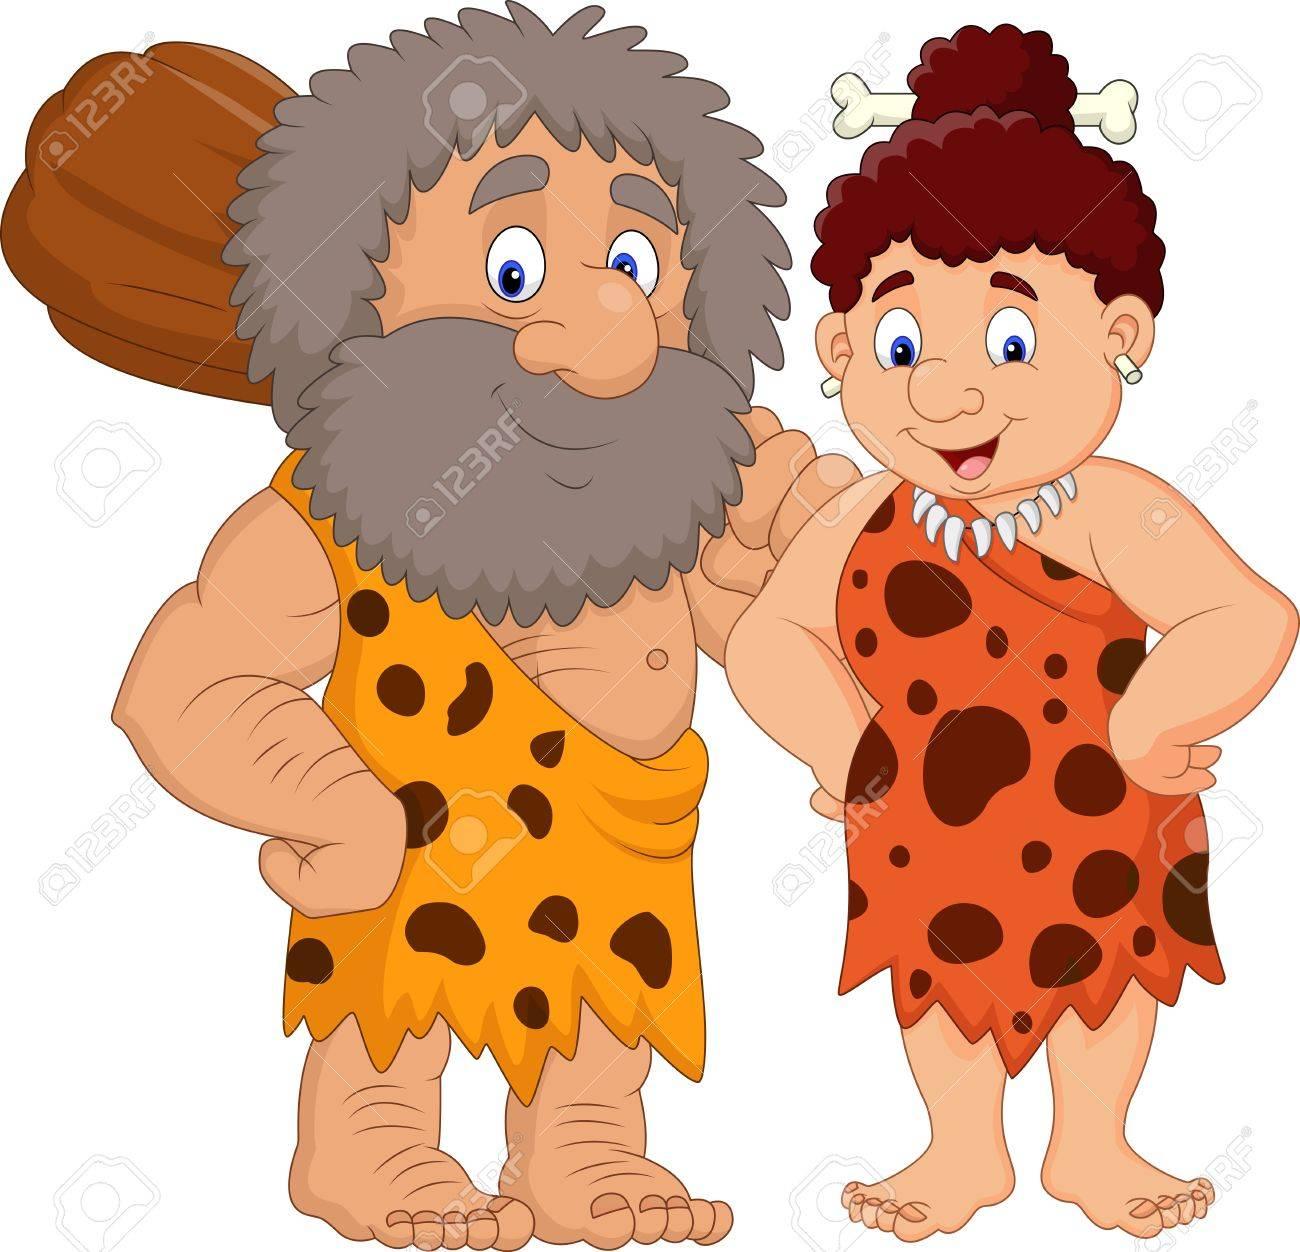 Vector illustration of Cartoon prehistoric caveman couple - 85233668